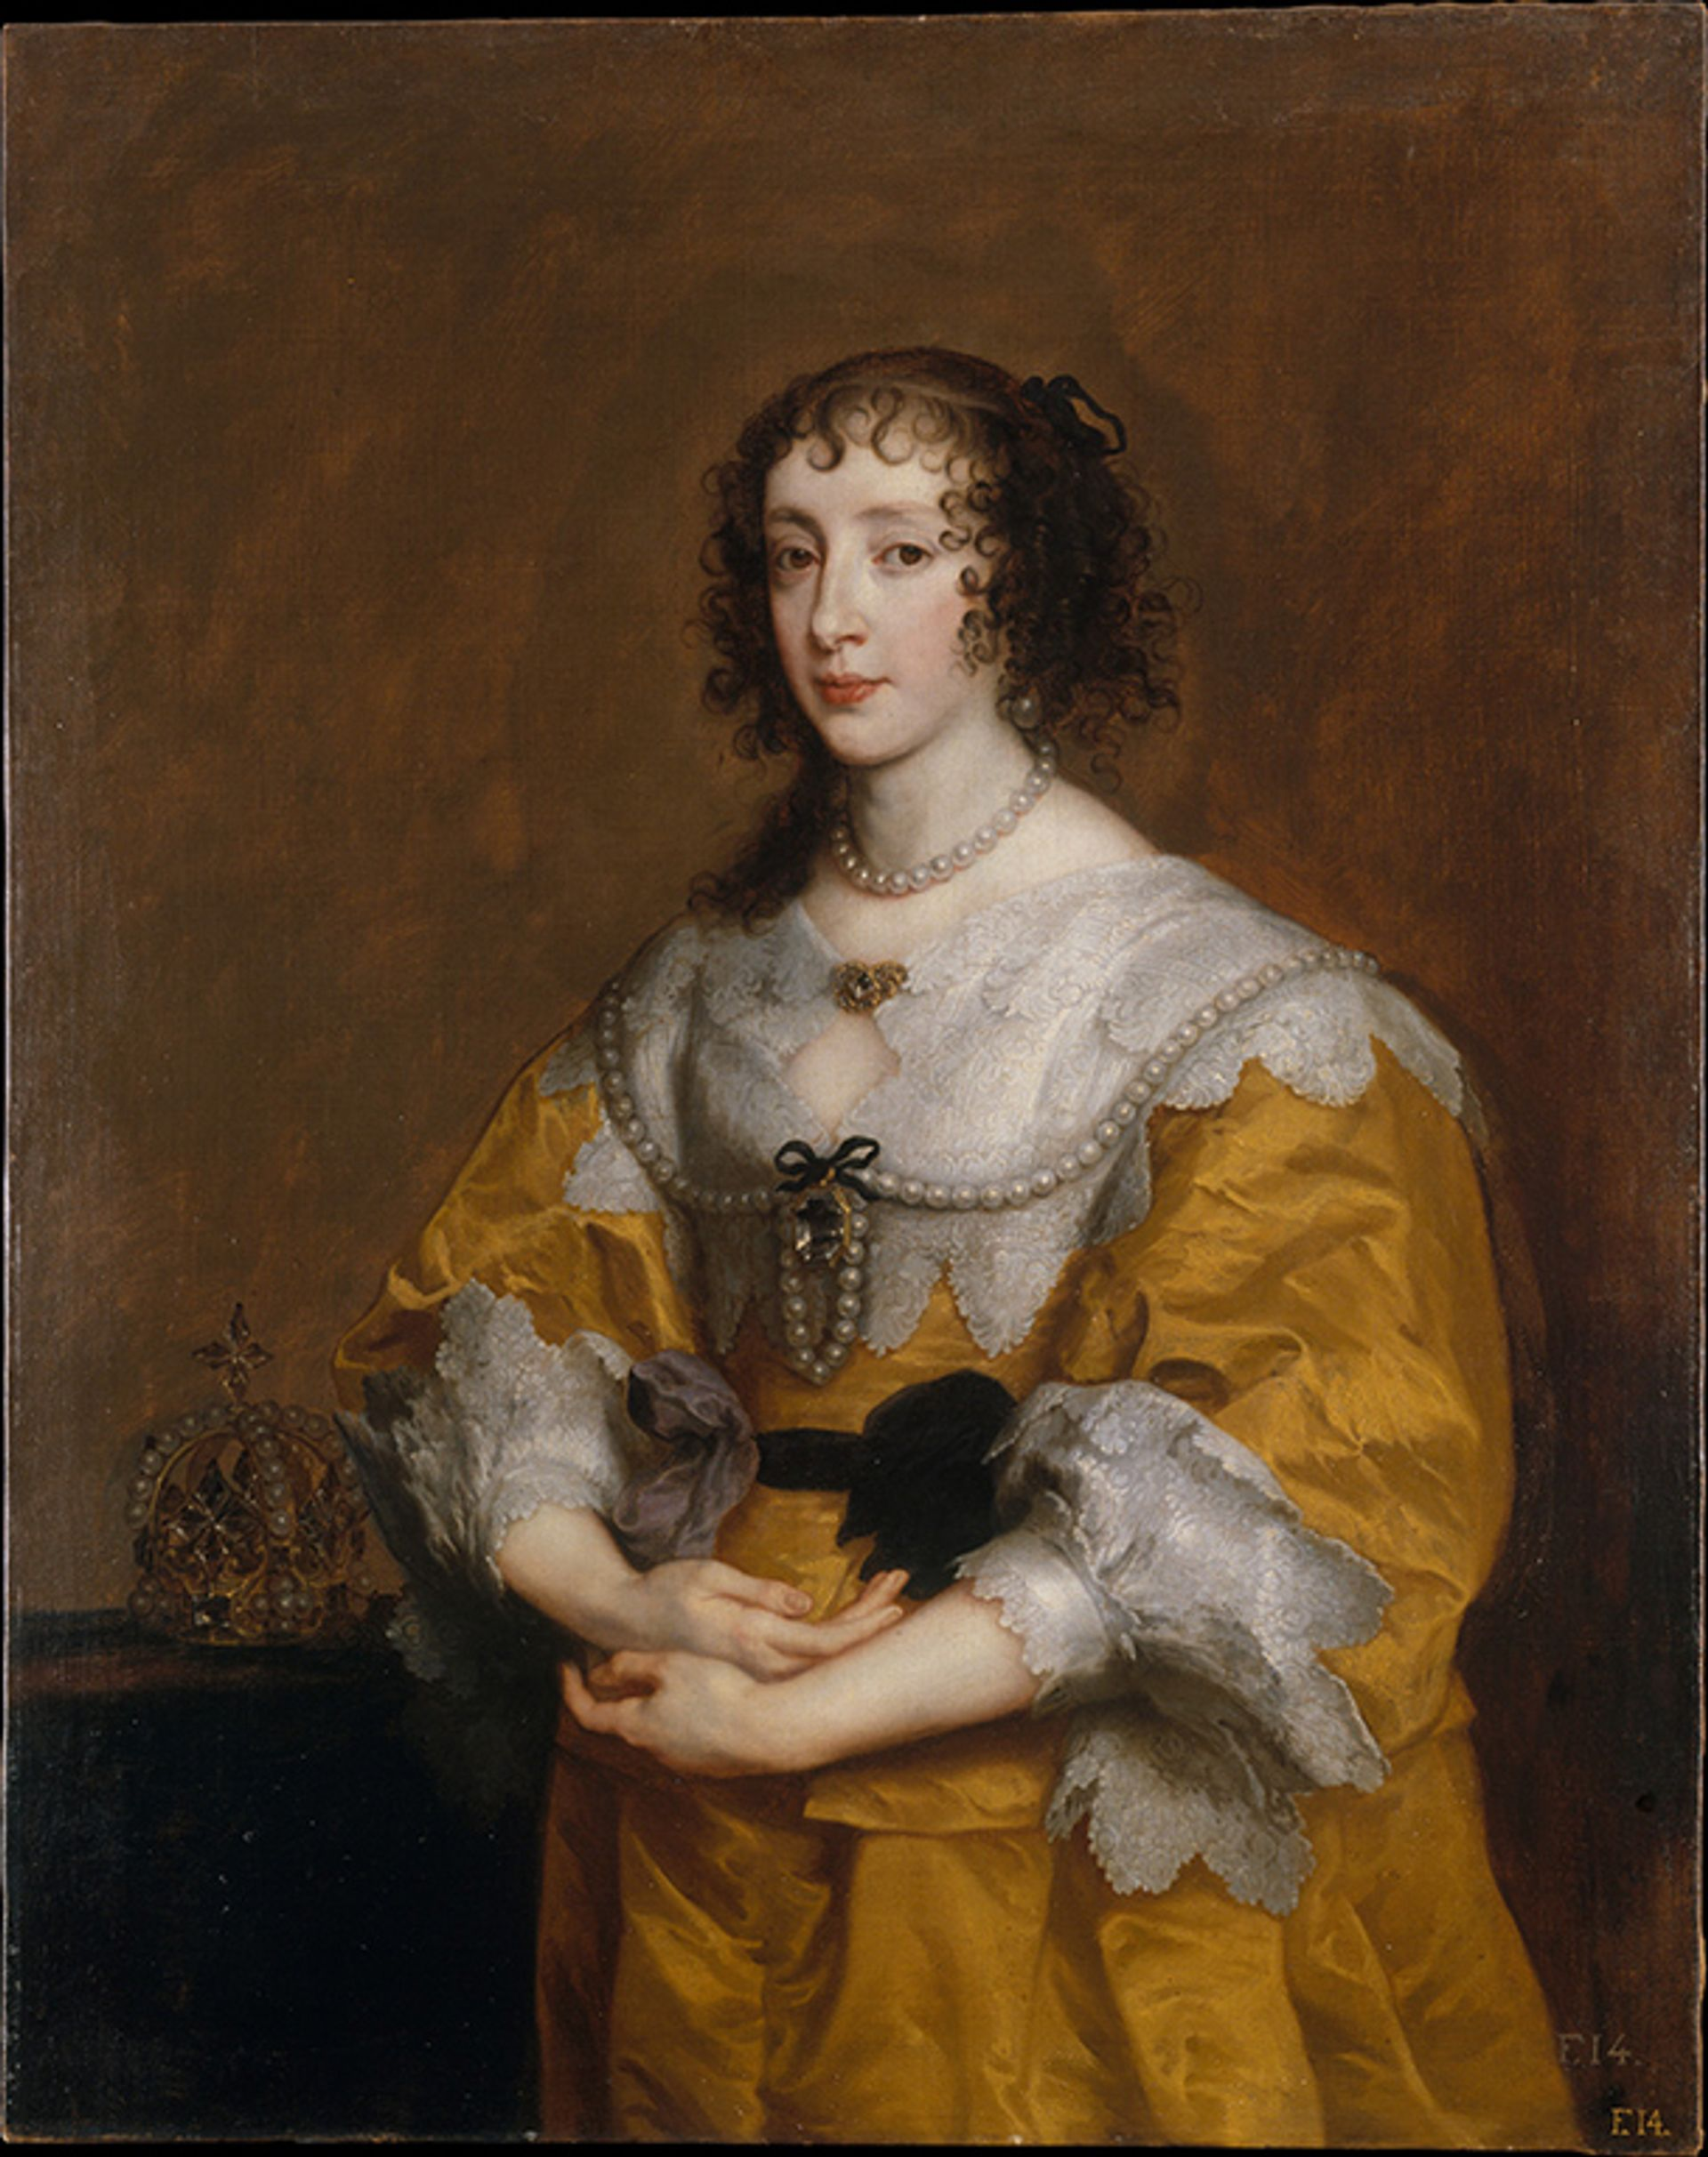 Anthony van Dyck's Queen Henrietta Maria (1636), part of a bequest by Jayne Wrightsman Metropolitan Museum of Art, New York, Bequest of Mrs. Charles Wrightsman in honour of Annette de la Renta, 2019